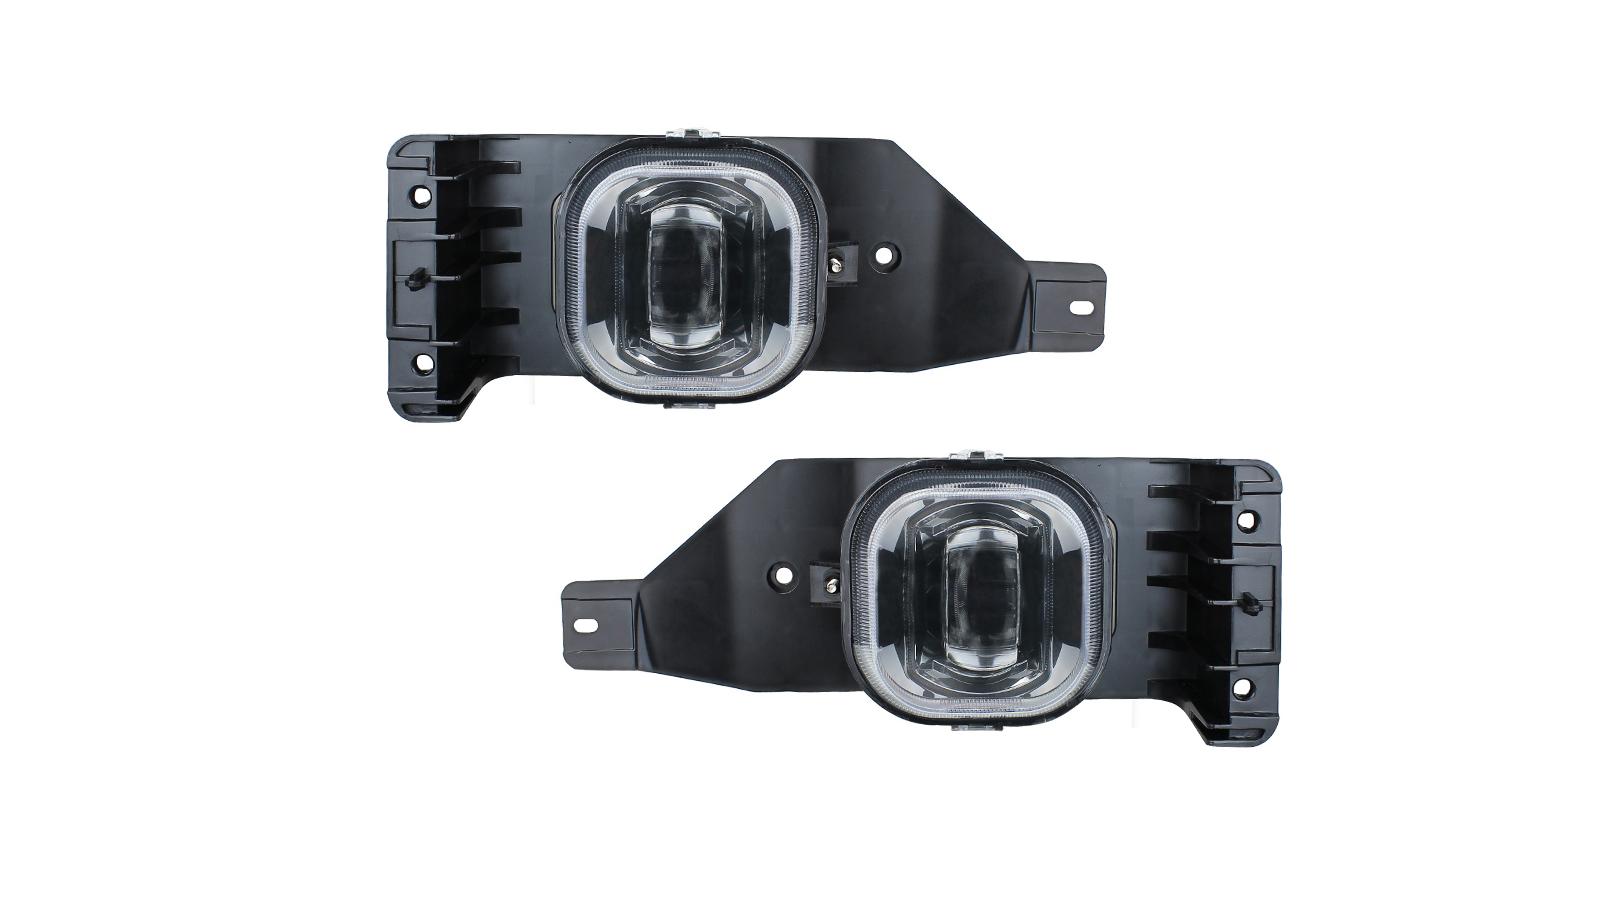 LED الضباب Light متوافق مع مصابيح القيادة 2006 2006 2007 2007 Ford F250 F350 OEM